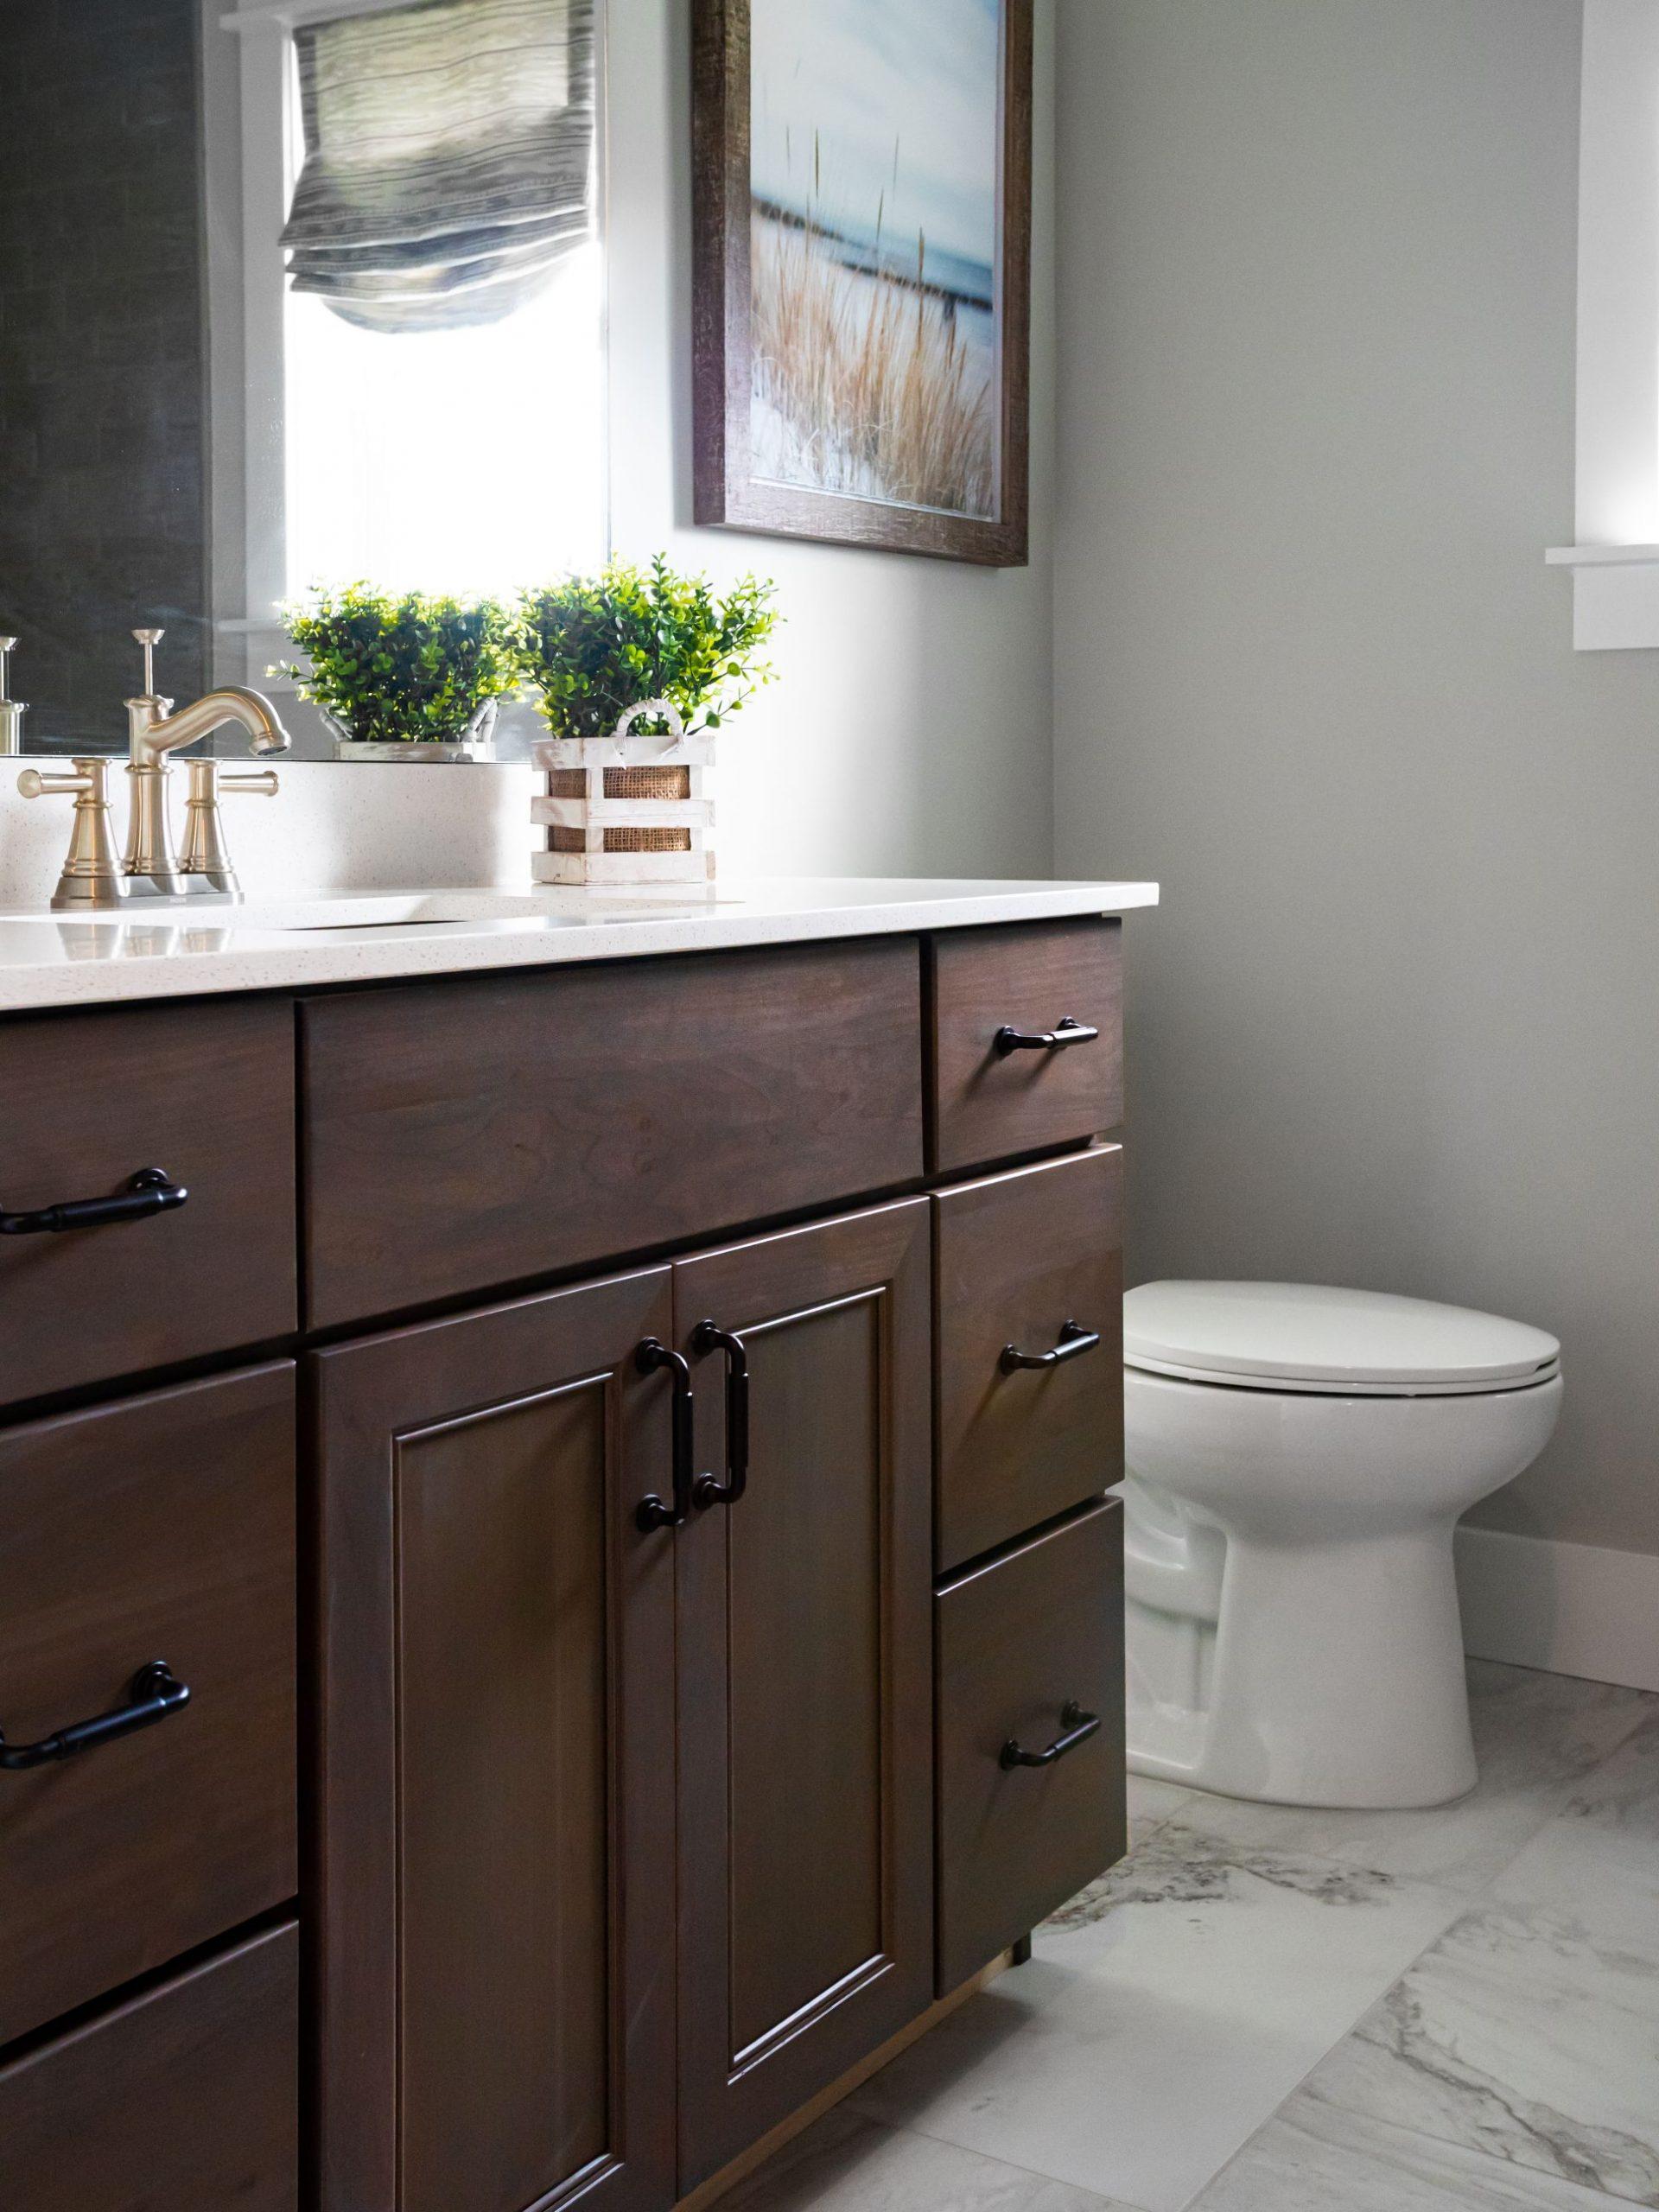 Aspect Landes Poplar Shadow bathroom vanity.